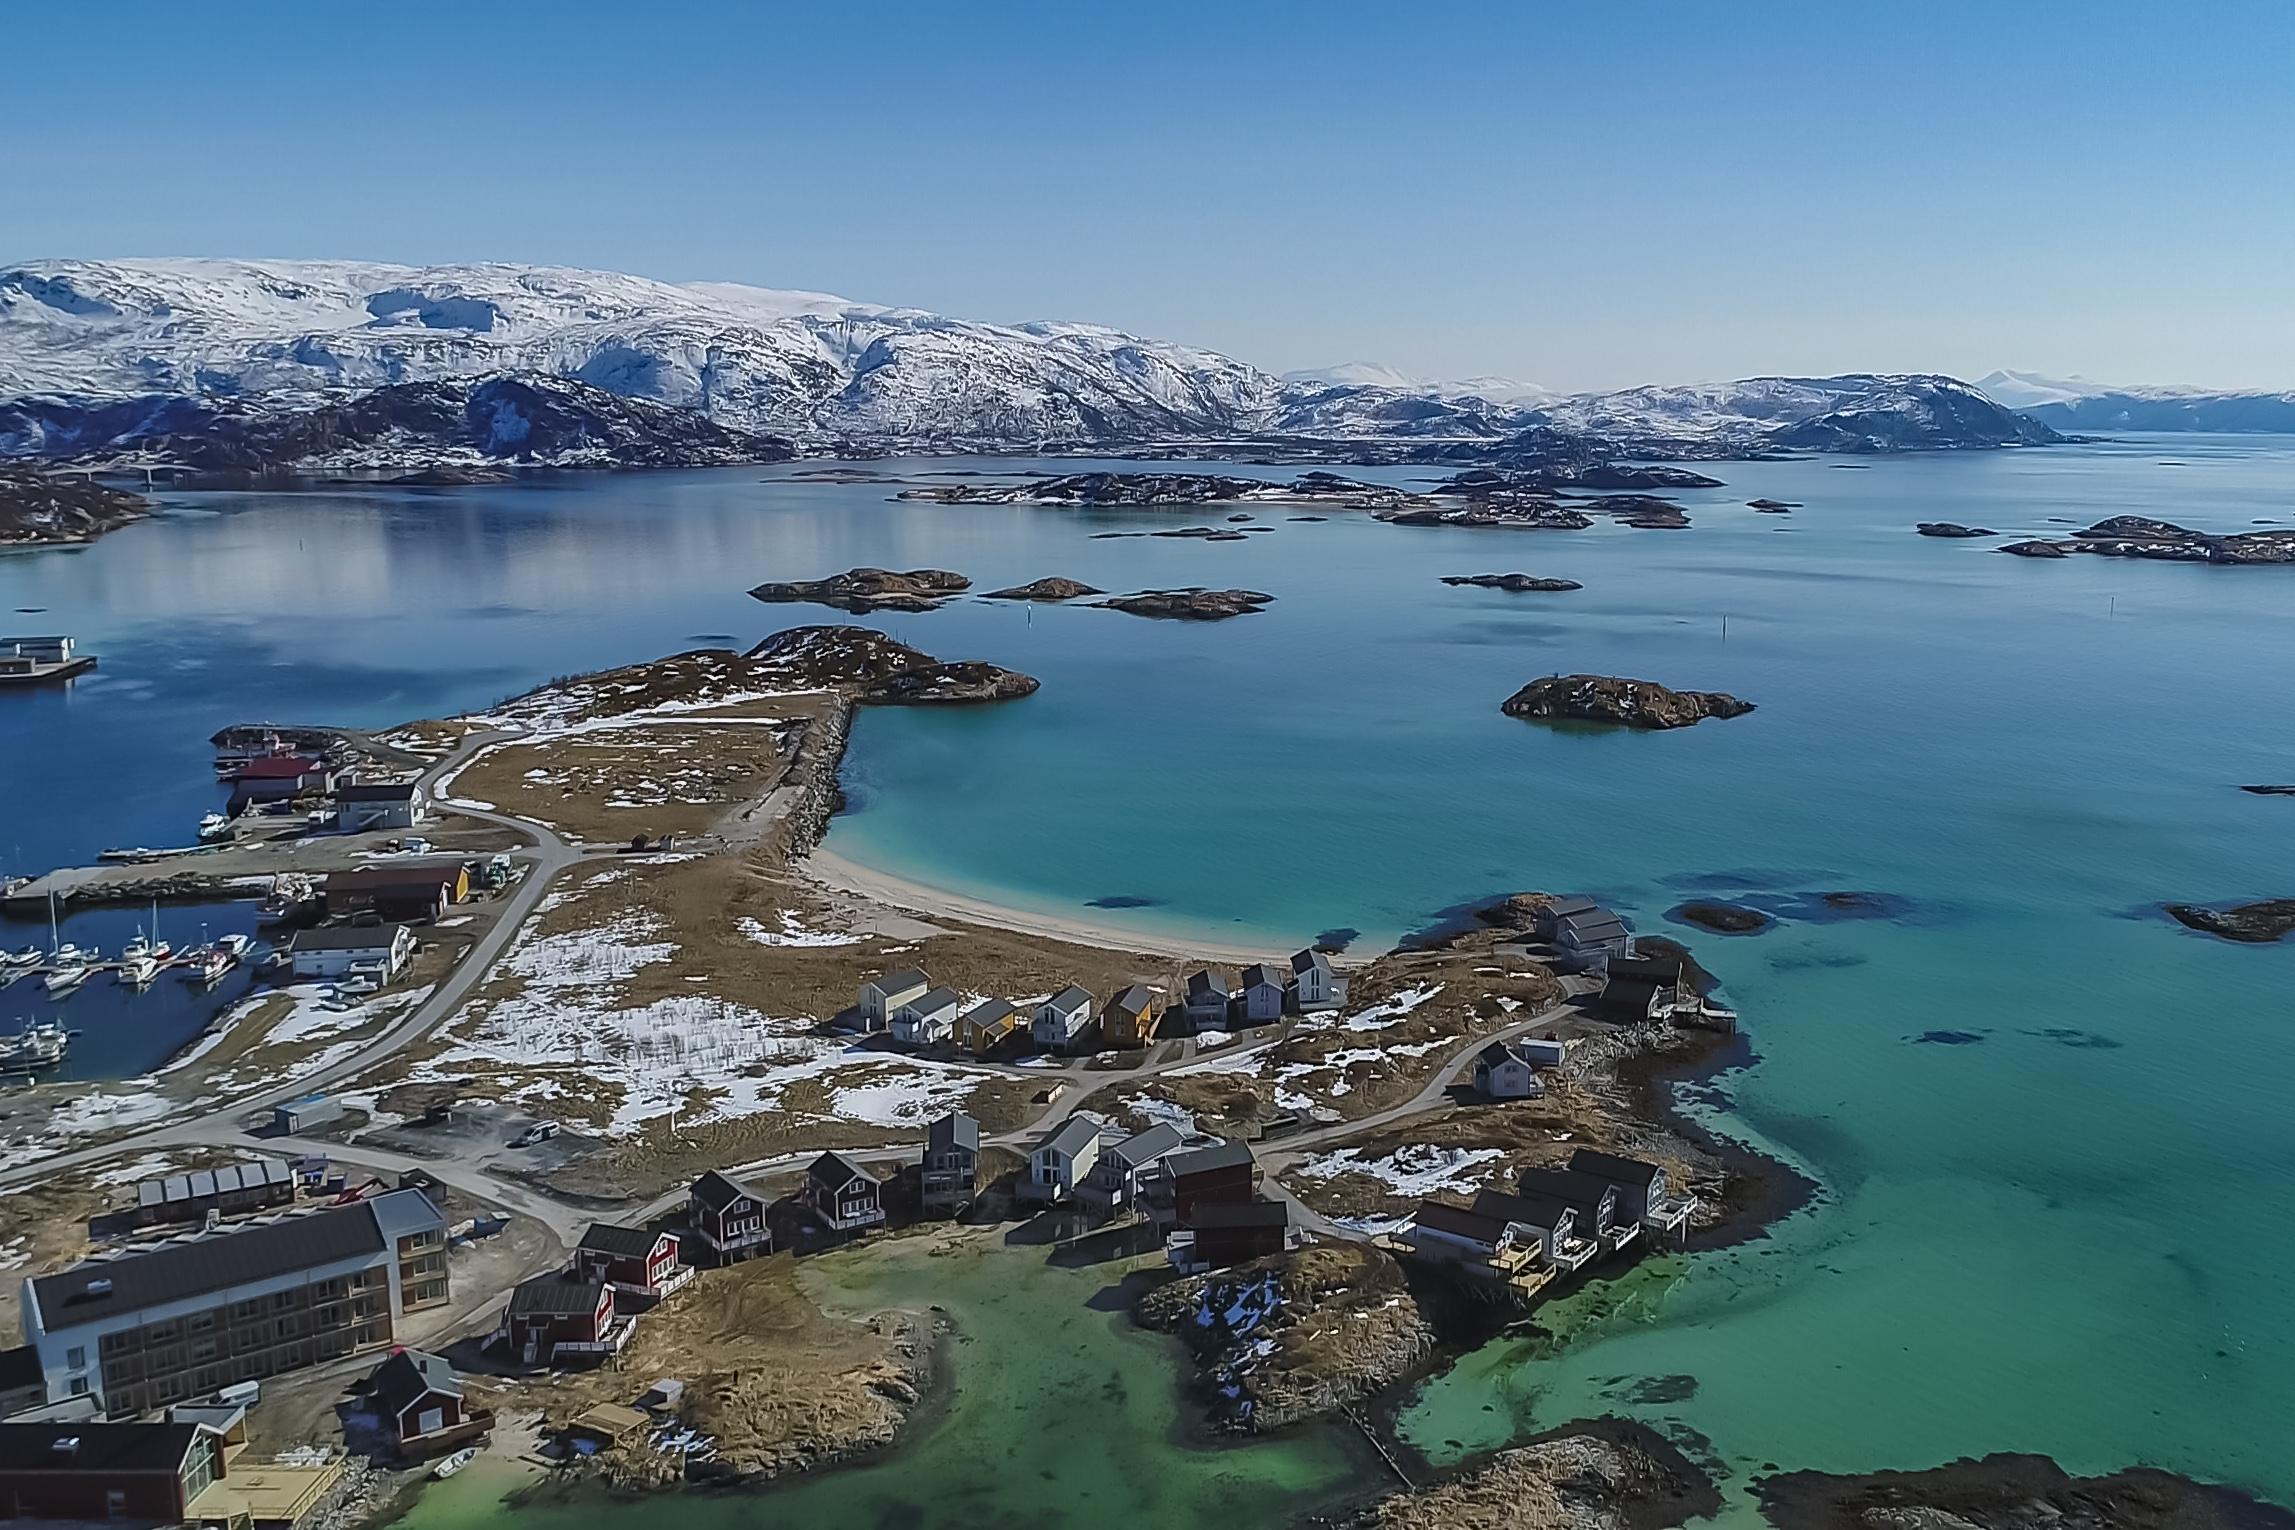 Foto: Sommarøy Arctic Hotel Tromsø/CC BY 2.0 via Flickr